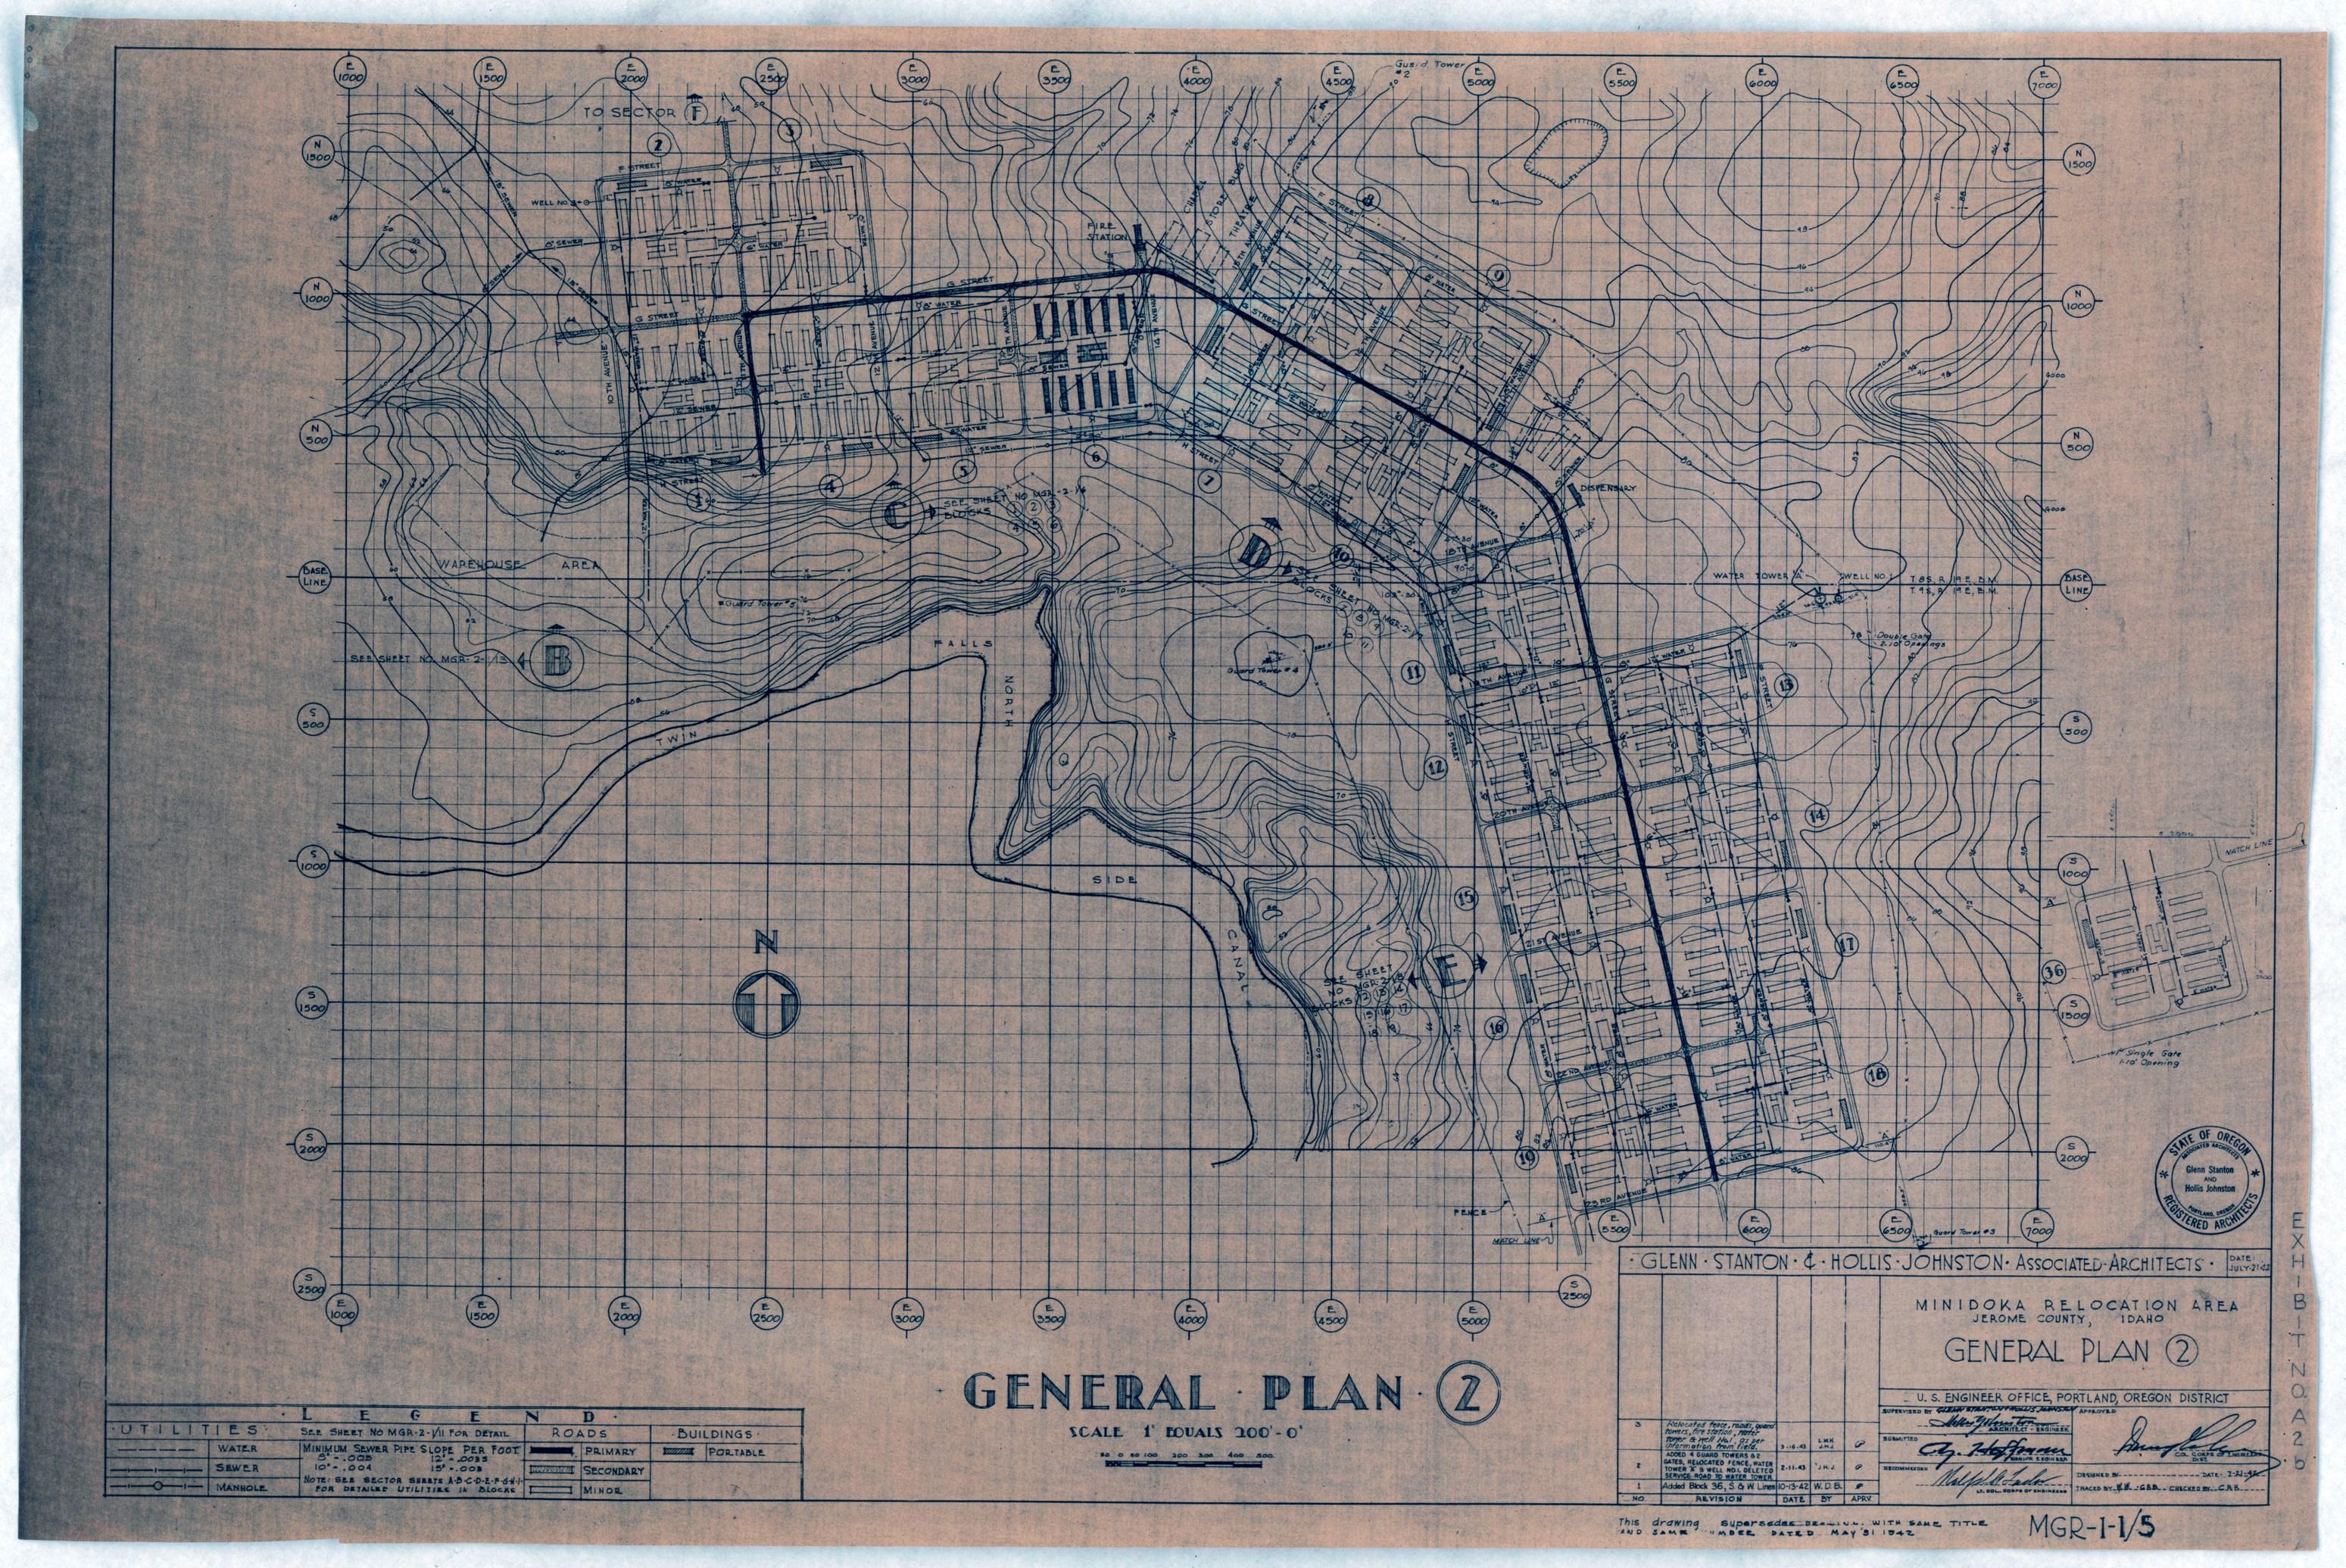 Idaho- Minidoka- General Plan 2